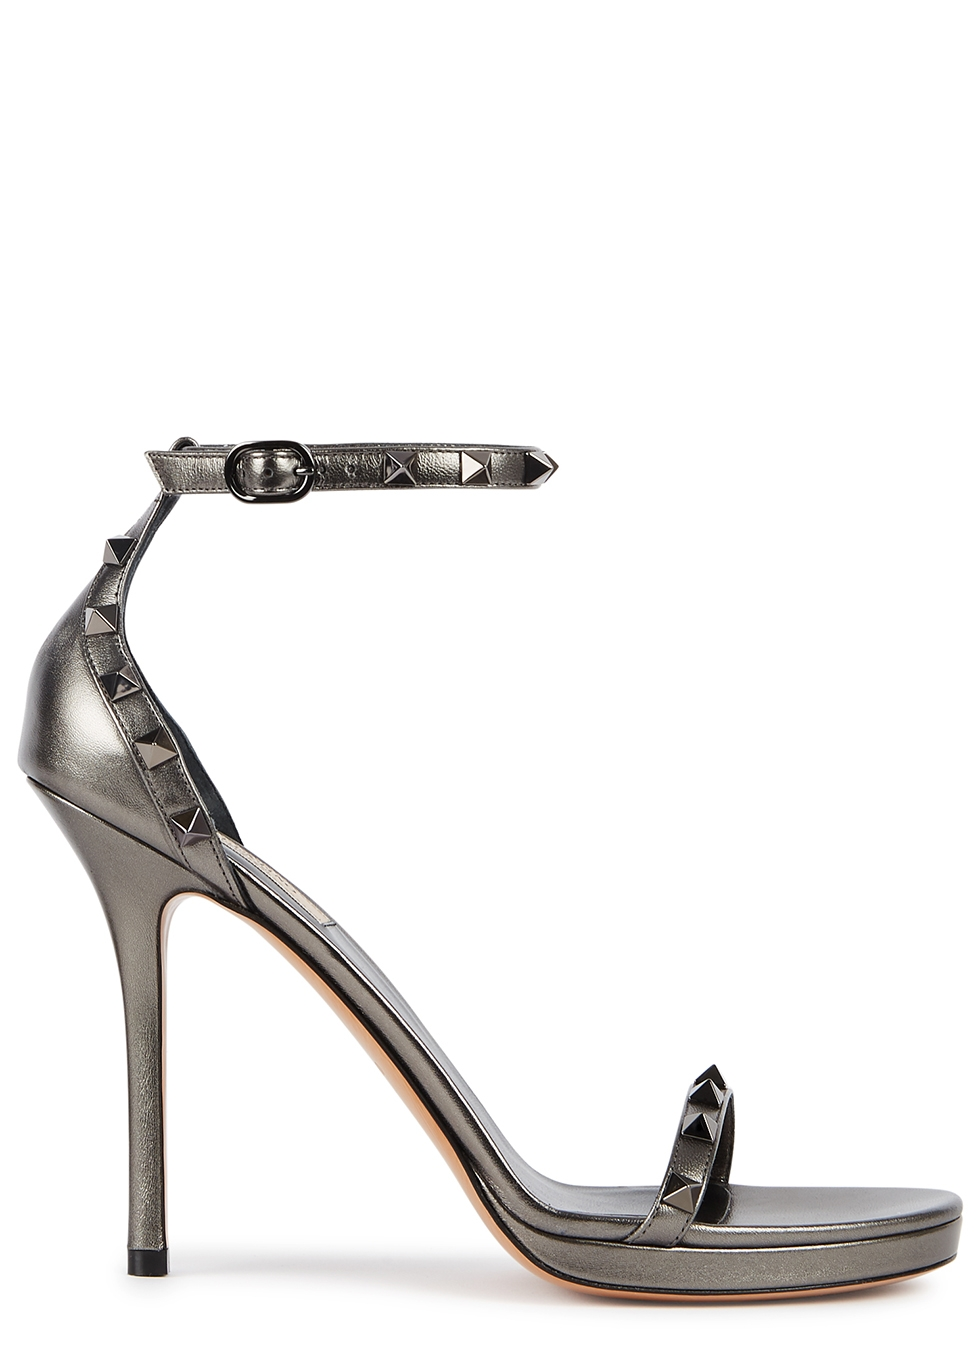 Valentino Garavani Rockstud 100 leather platform sandals